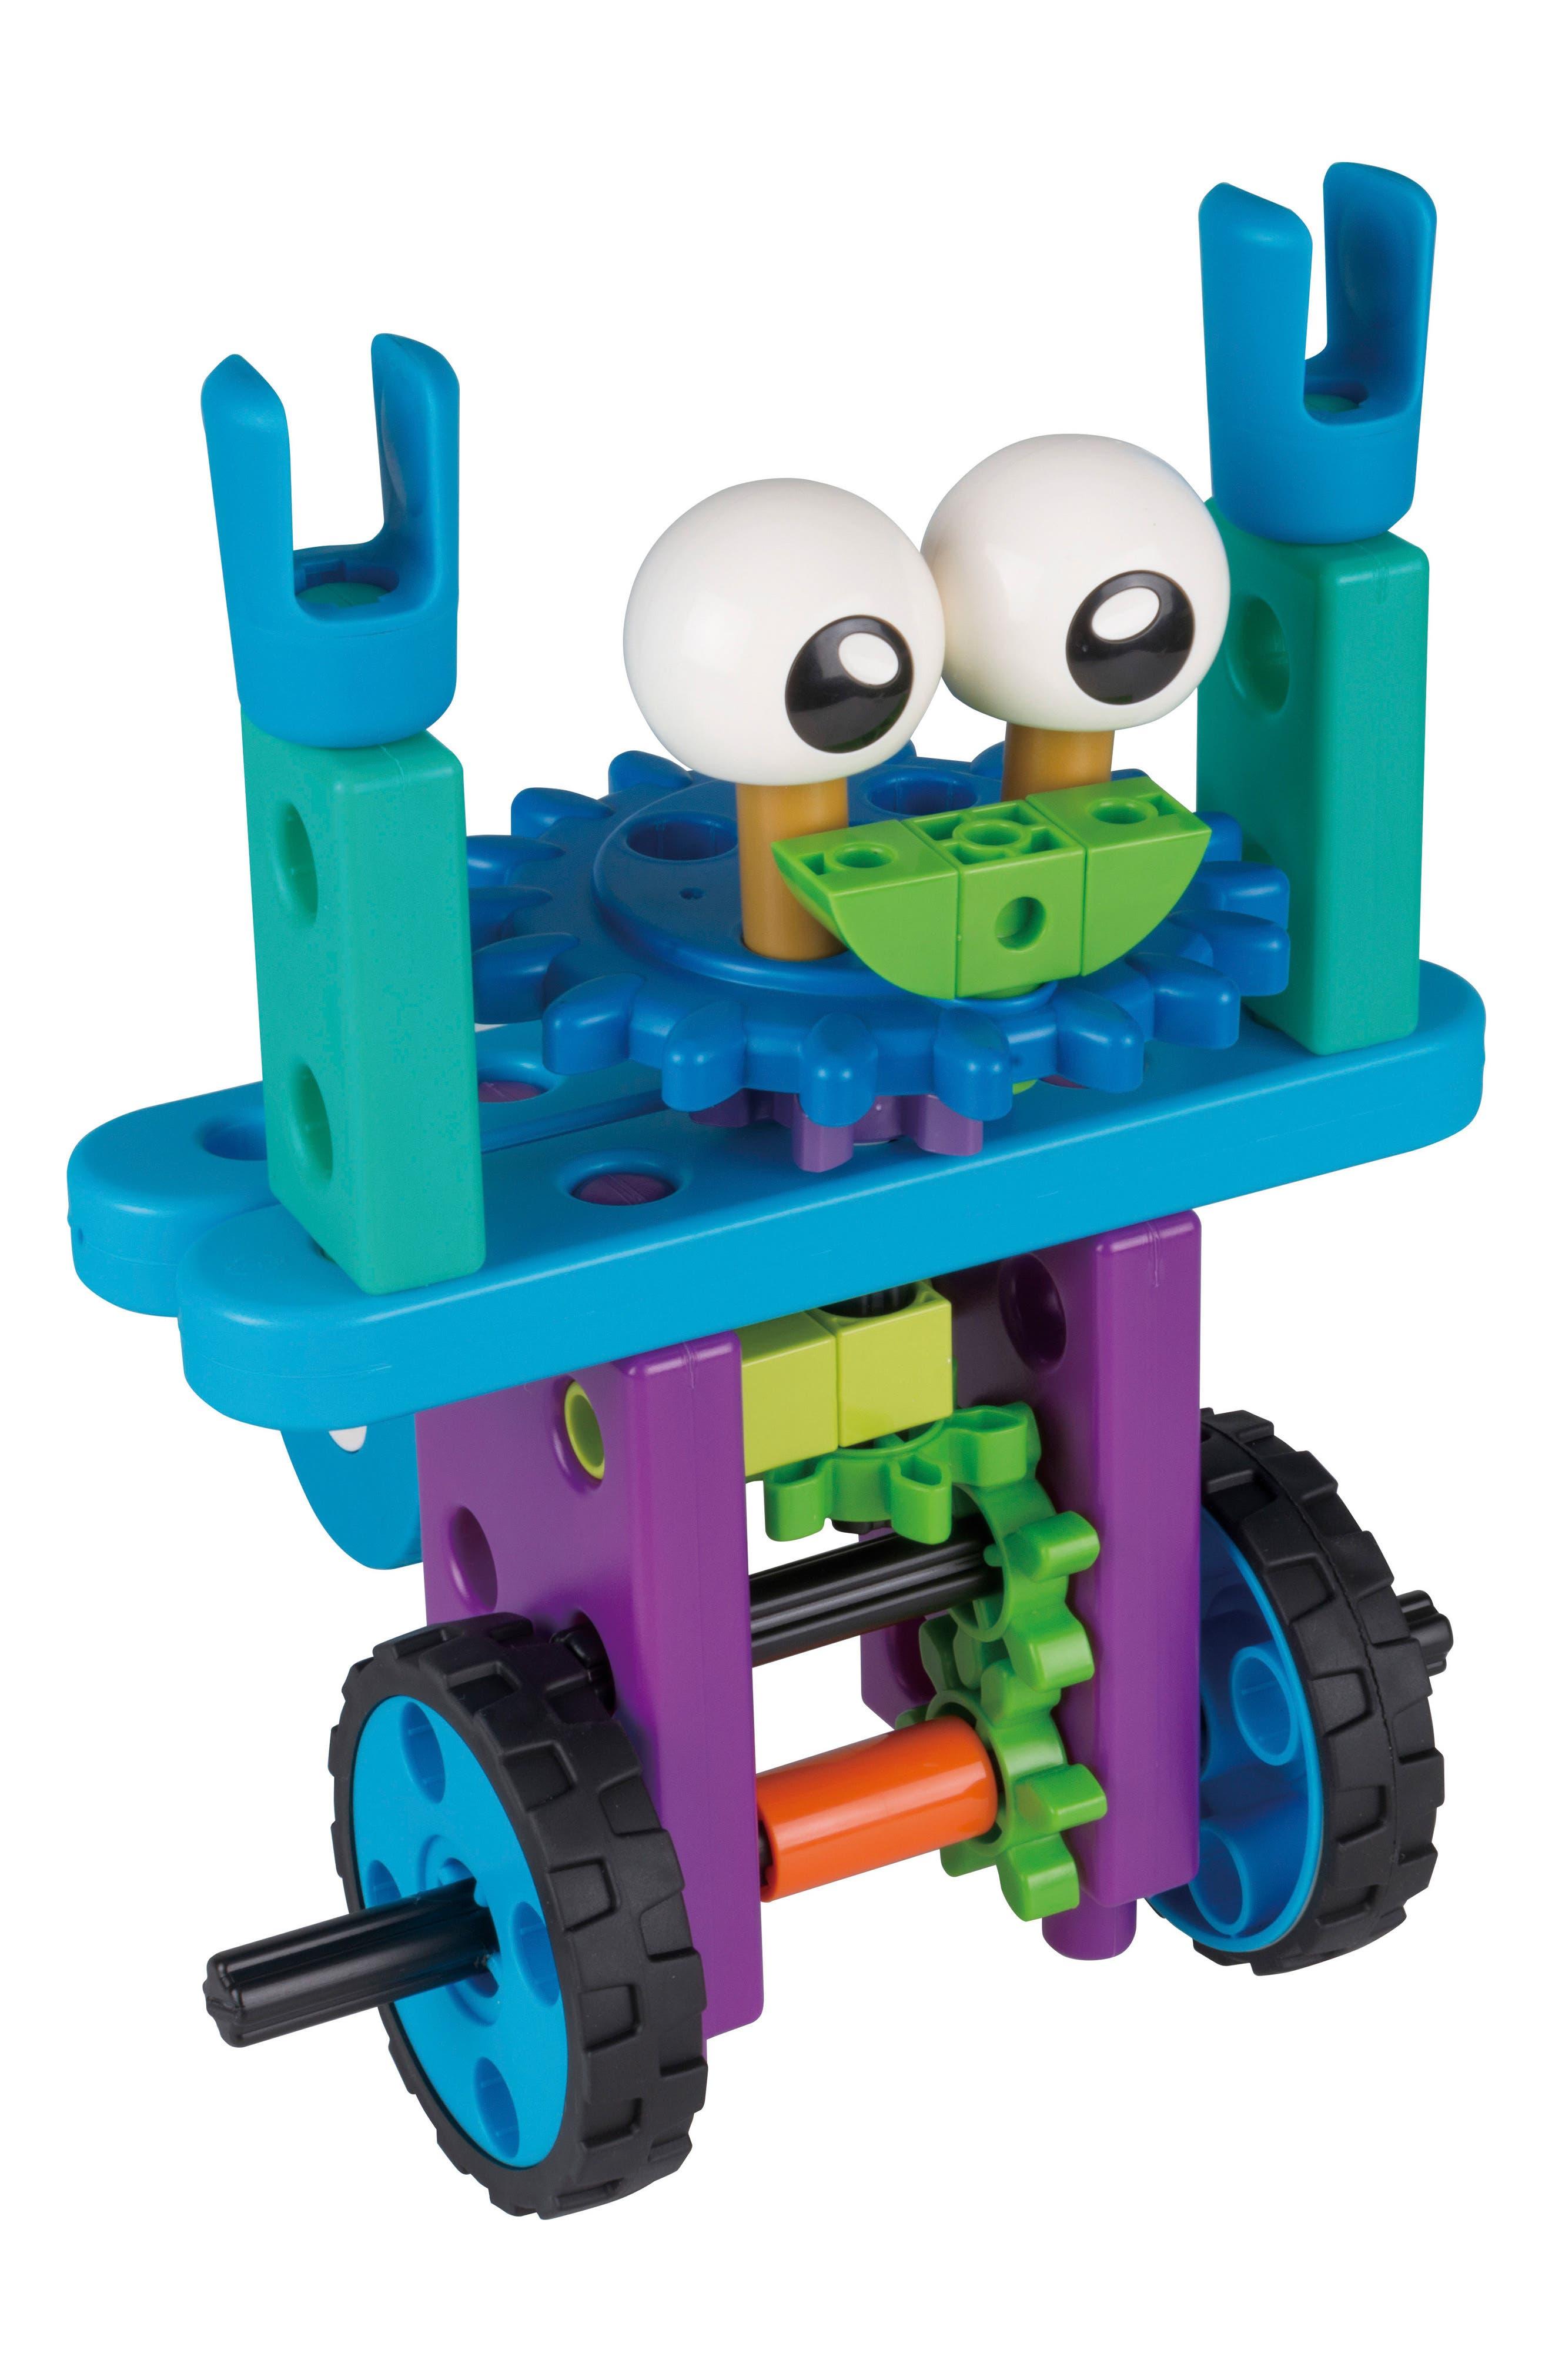 Robot Engineer Building Set & Storybook,                             Alternate thumbnail 5, color,                             Blue